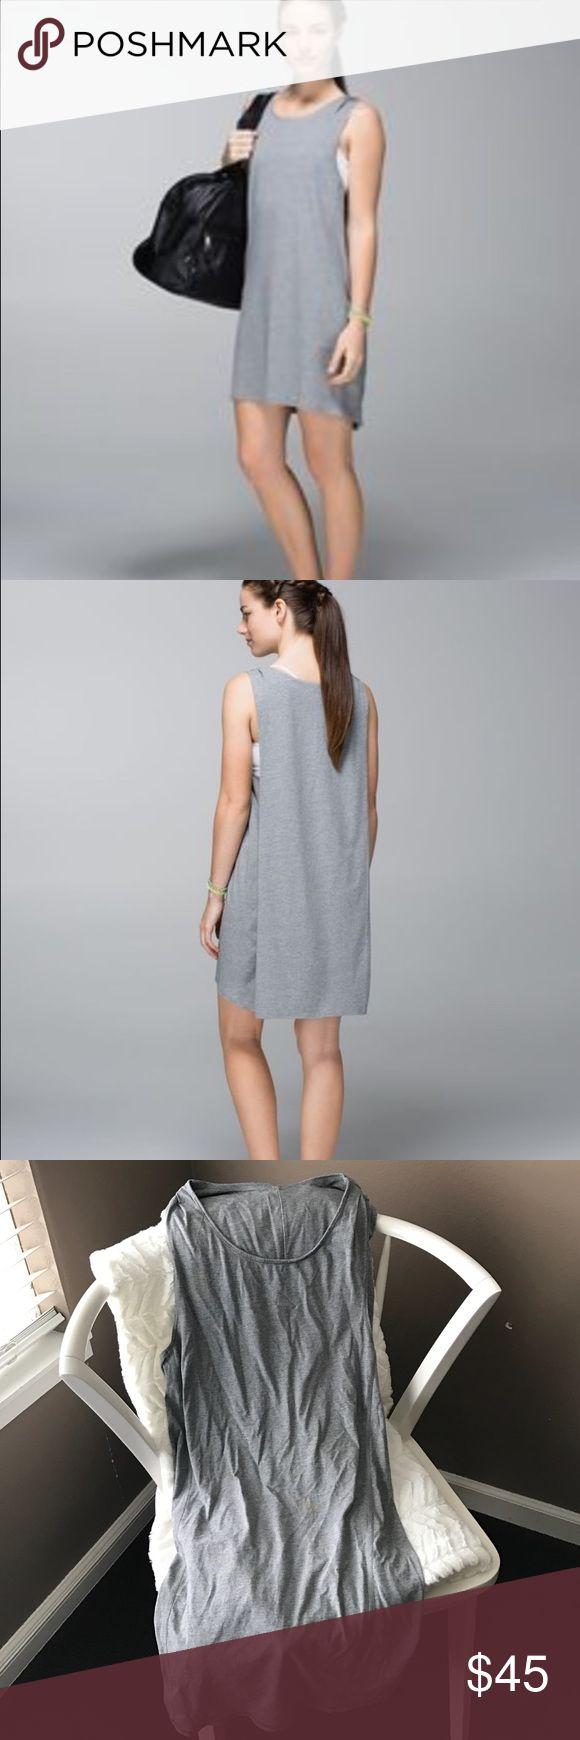 Lululemon dress Awesome used condition dress lululemon sz 6 grey 😀 just a little wrinkled from drawer lululemon athletica Dresses